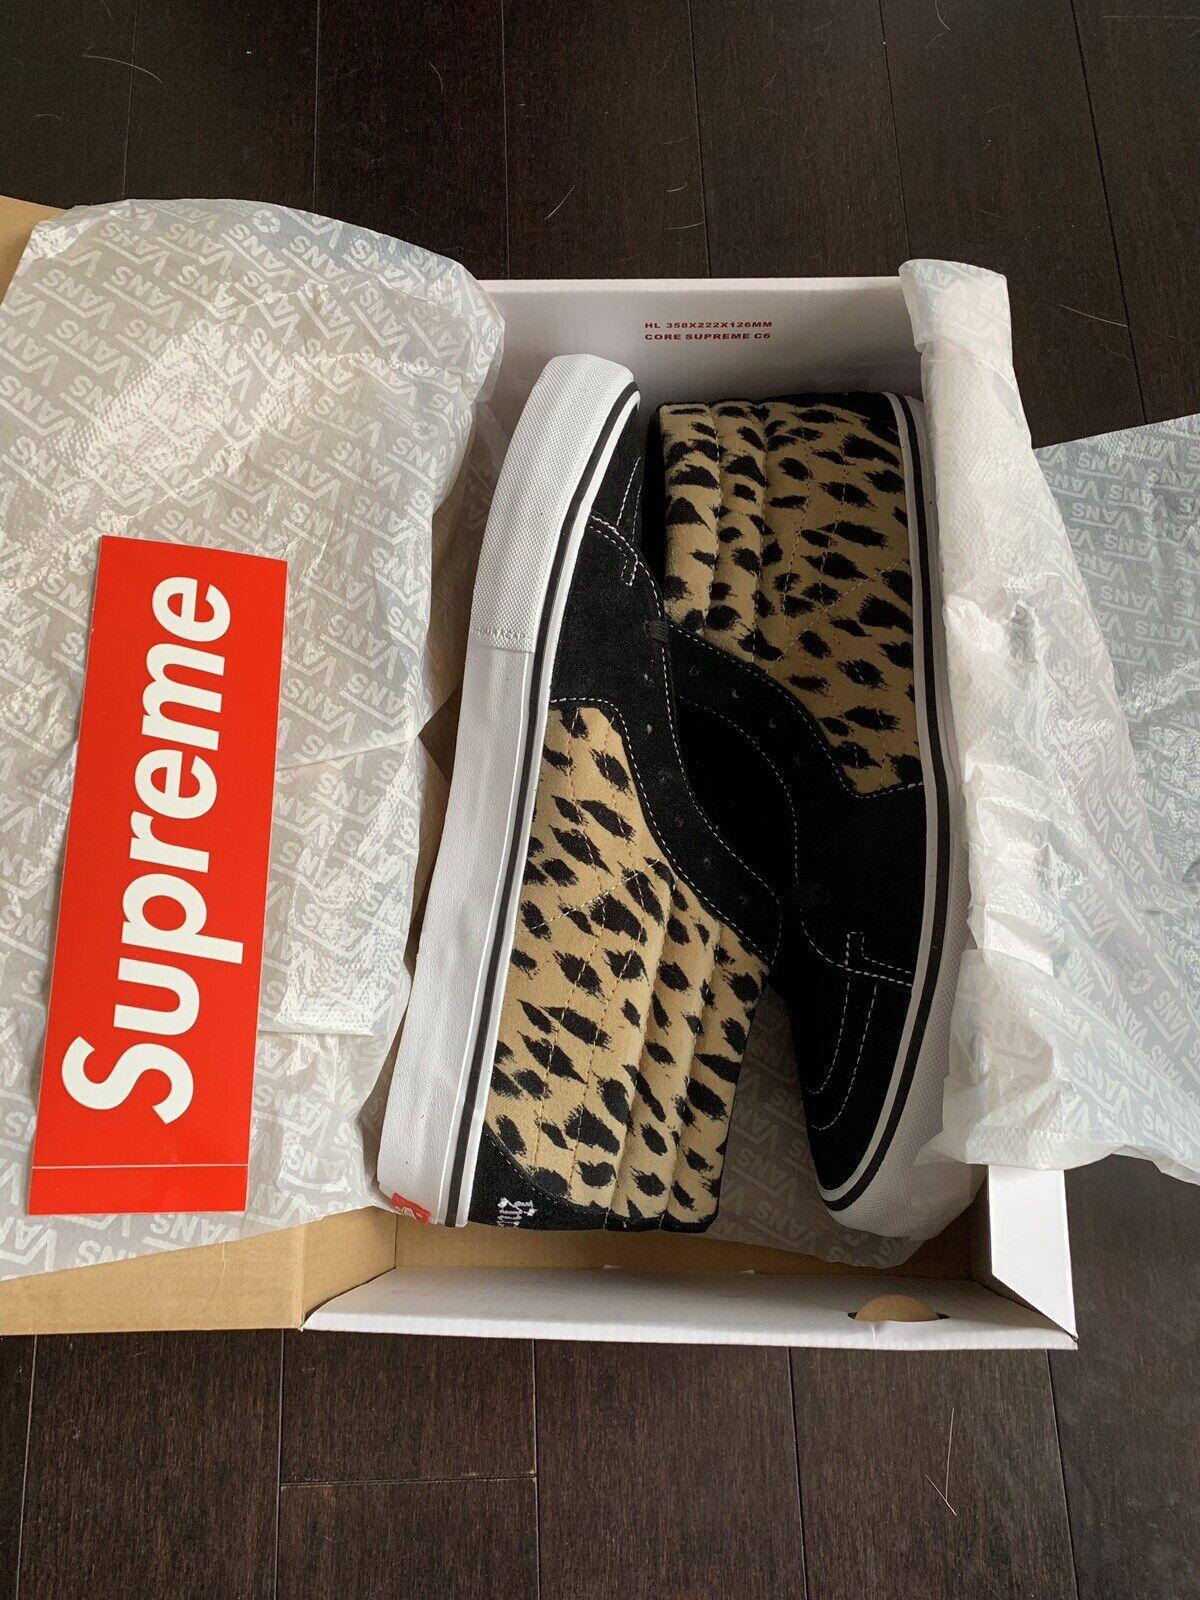 Vans supreme sk8 mid Cheetah Size 13